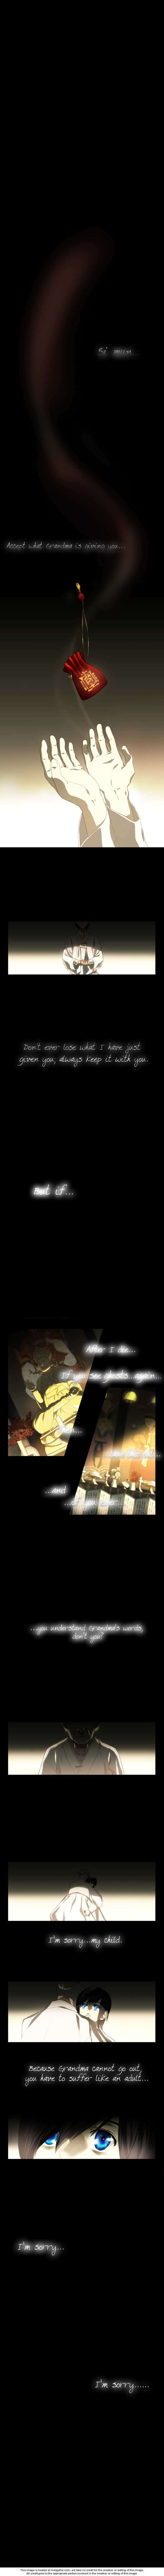 Supernatural Investigation Department 1 Page 2